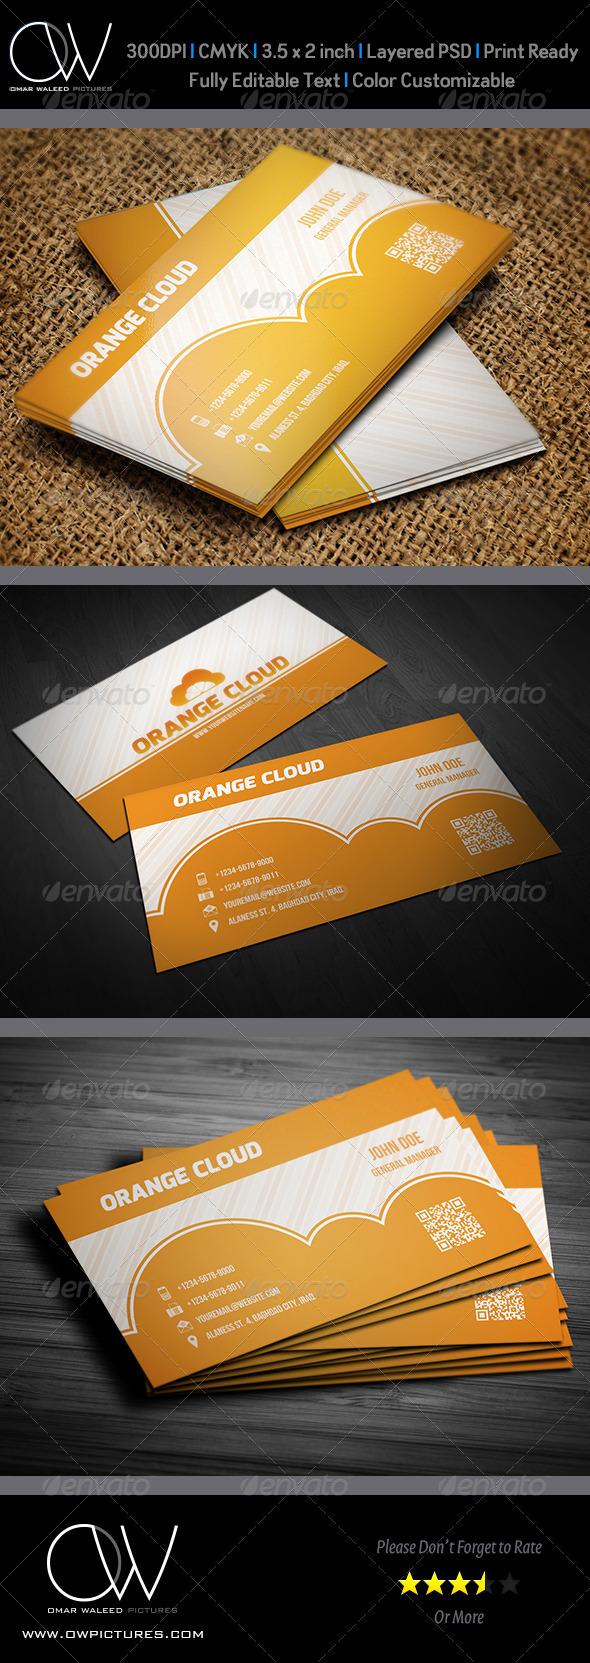 Orange Cloud Business Card - Business Cards Print Templates